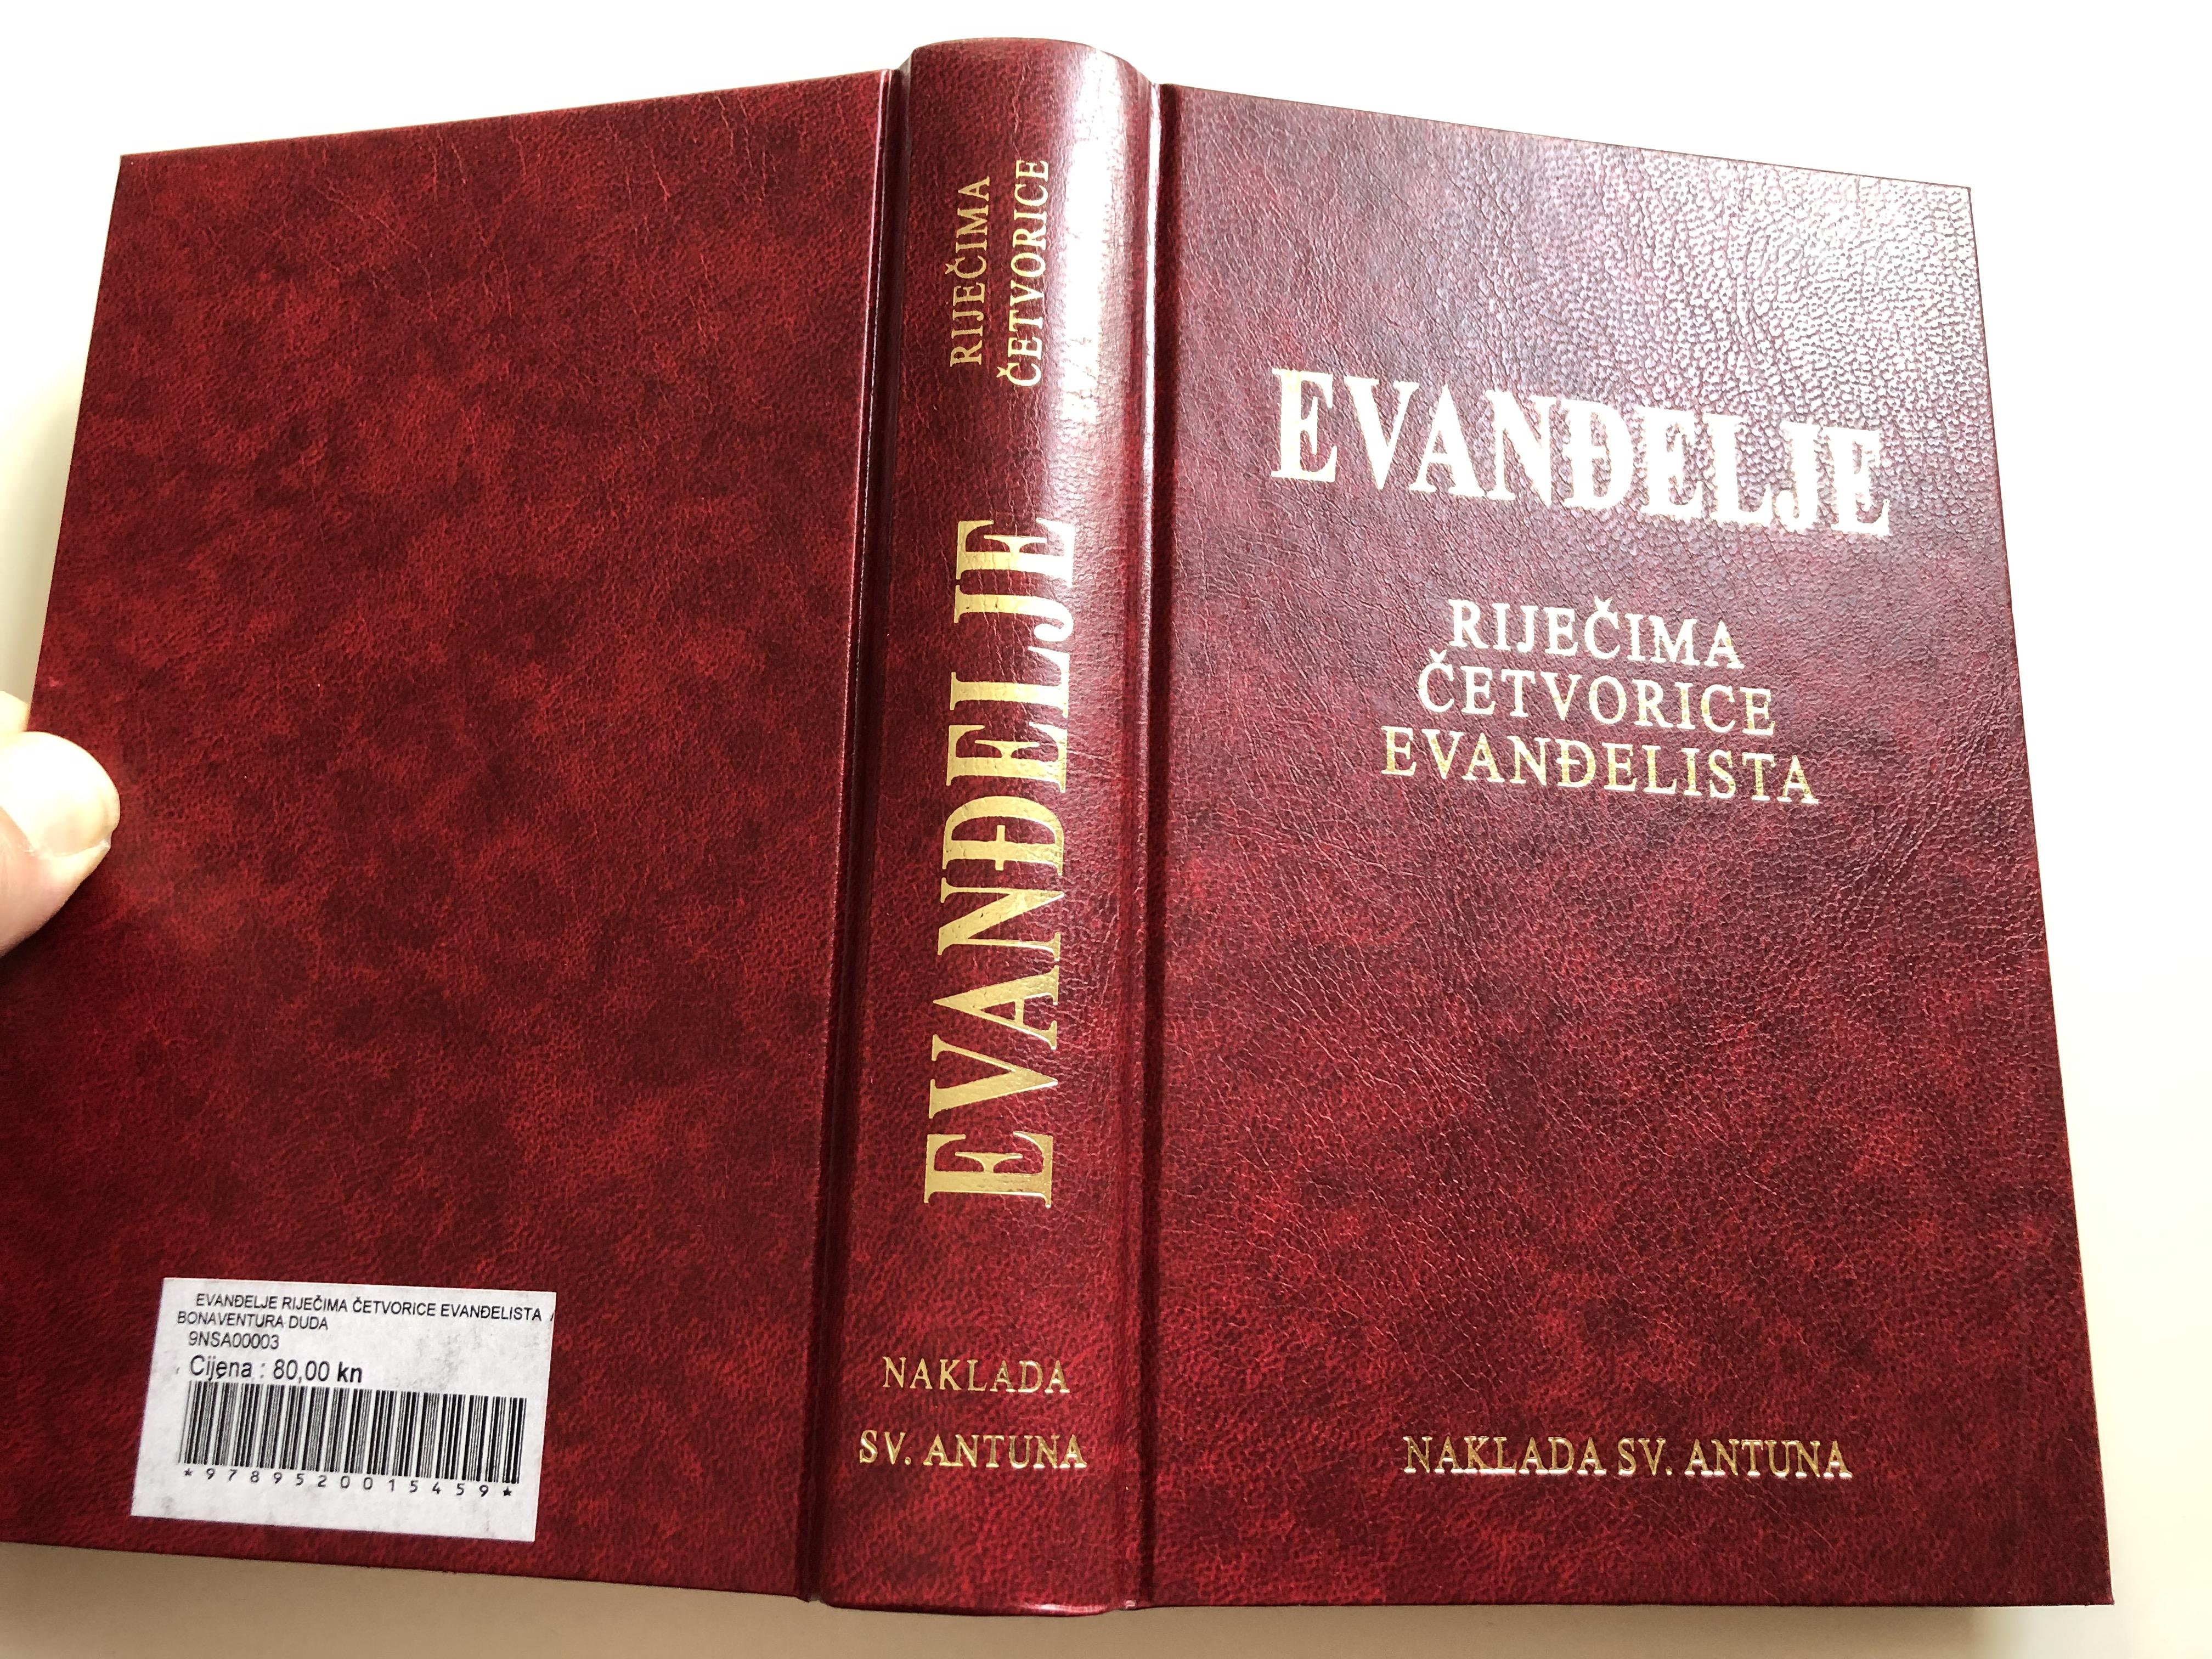 evan-elje-re-ima-etvorice-evan-elista-croatian-language-edition-of-il-vangelo-18.jpg